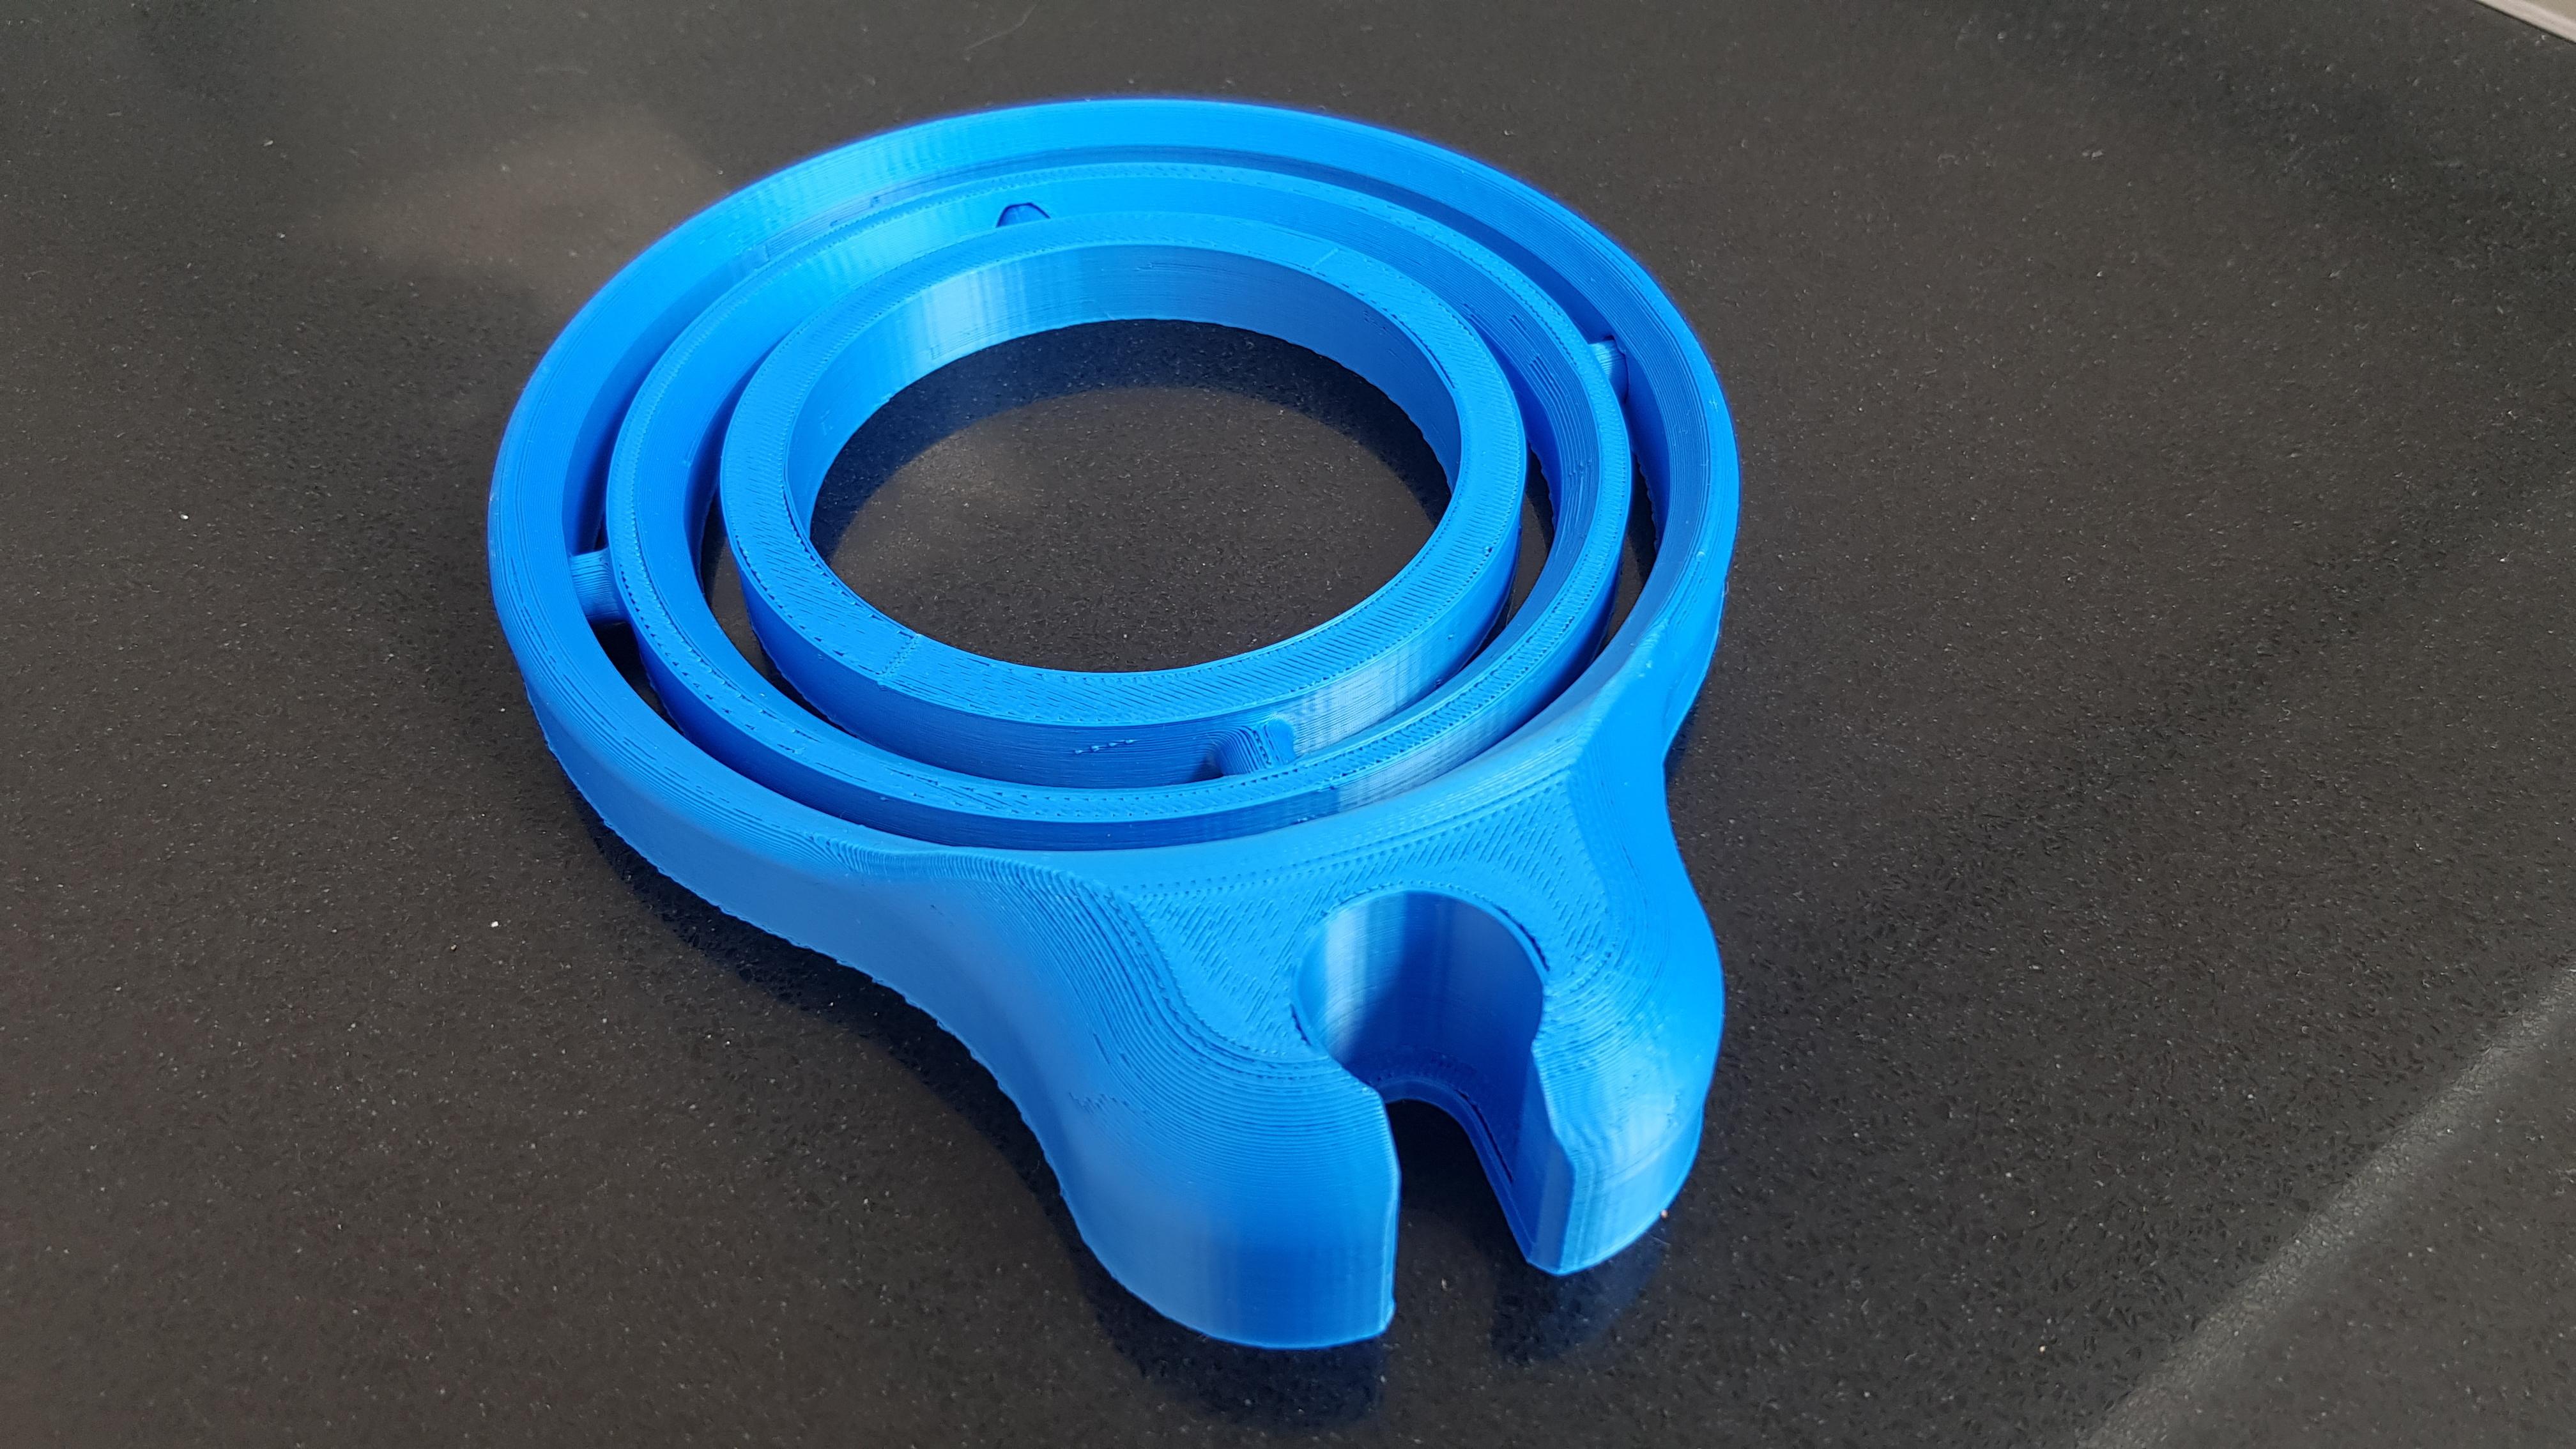 20200412_142619.jpg Download STL file Self-righting gimballed drinks holder - 2020 Pint Glass Version • 3D printable template, 3D-Designs